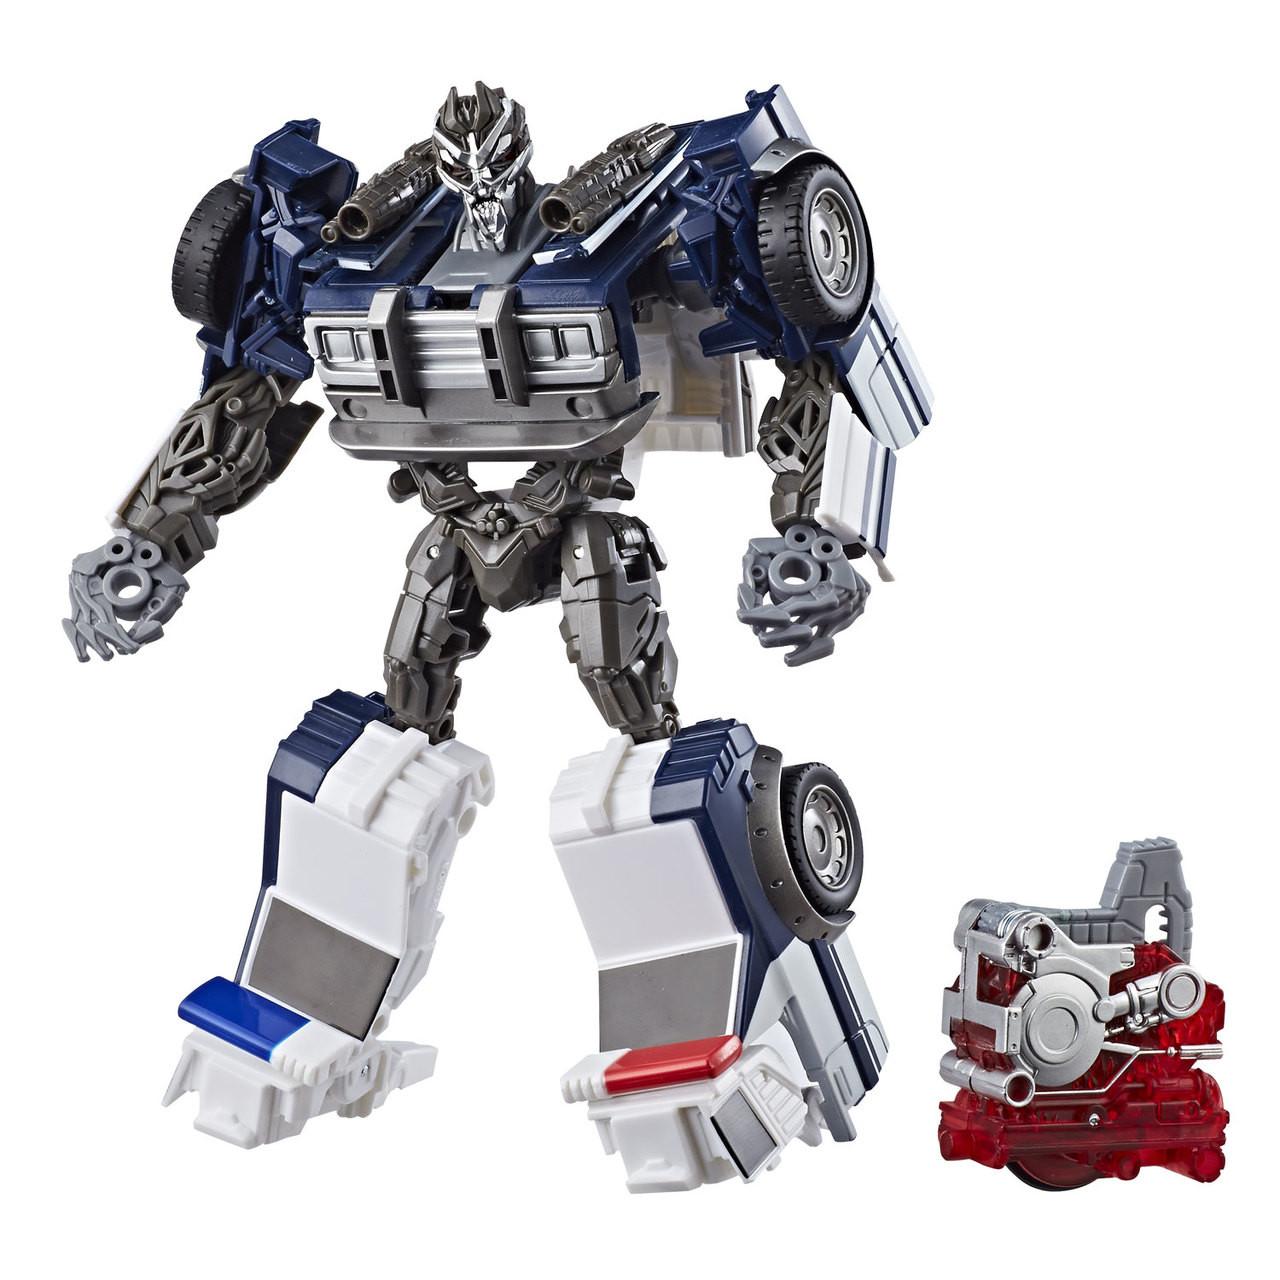 Transformers Bumblebee Movie Energon Igniters Speed Series 3-inch Barricade